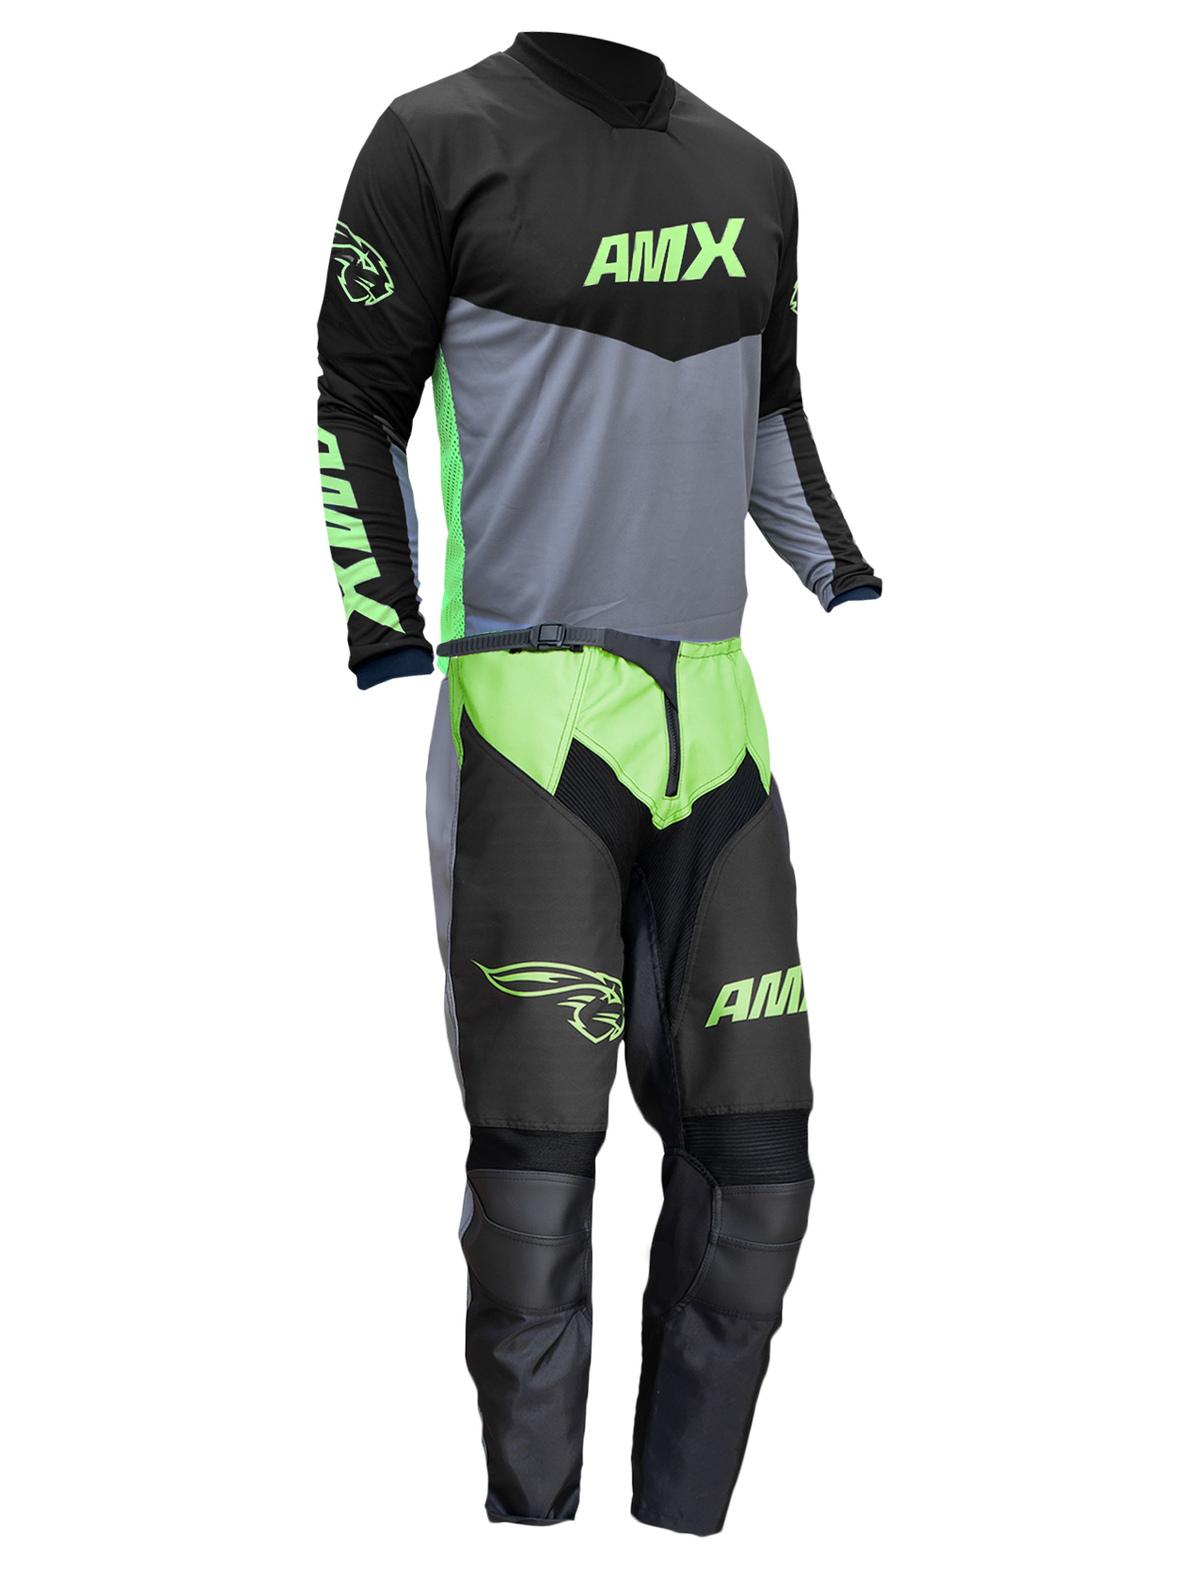 Conjunto Roupa Amx Cross Preto Neon Calça Camisa Trilha Motocross